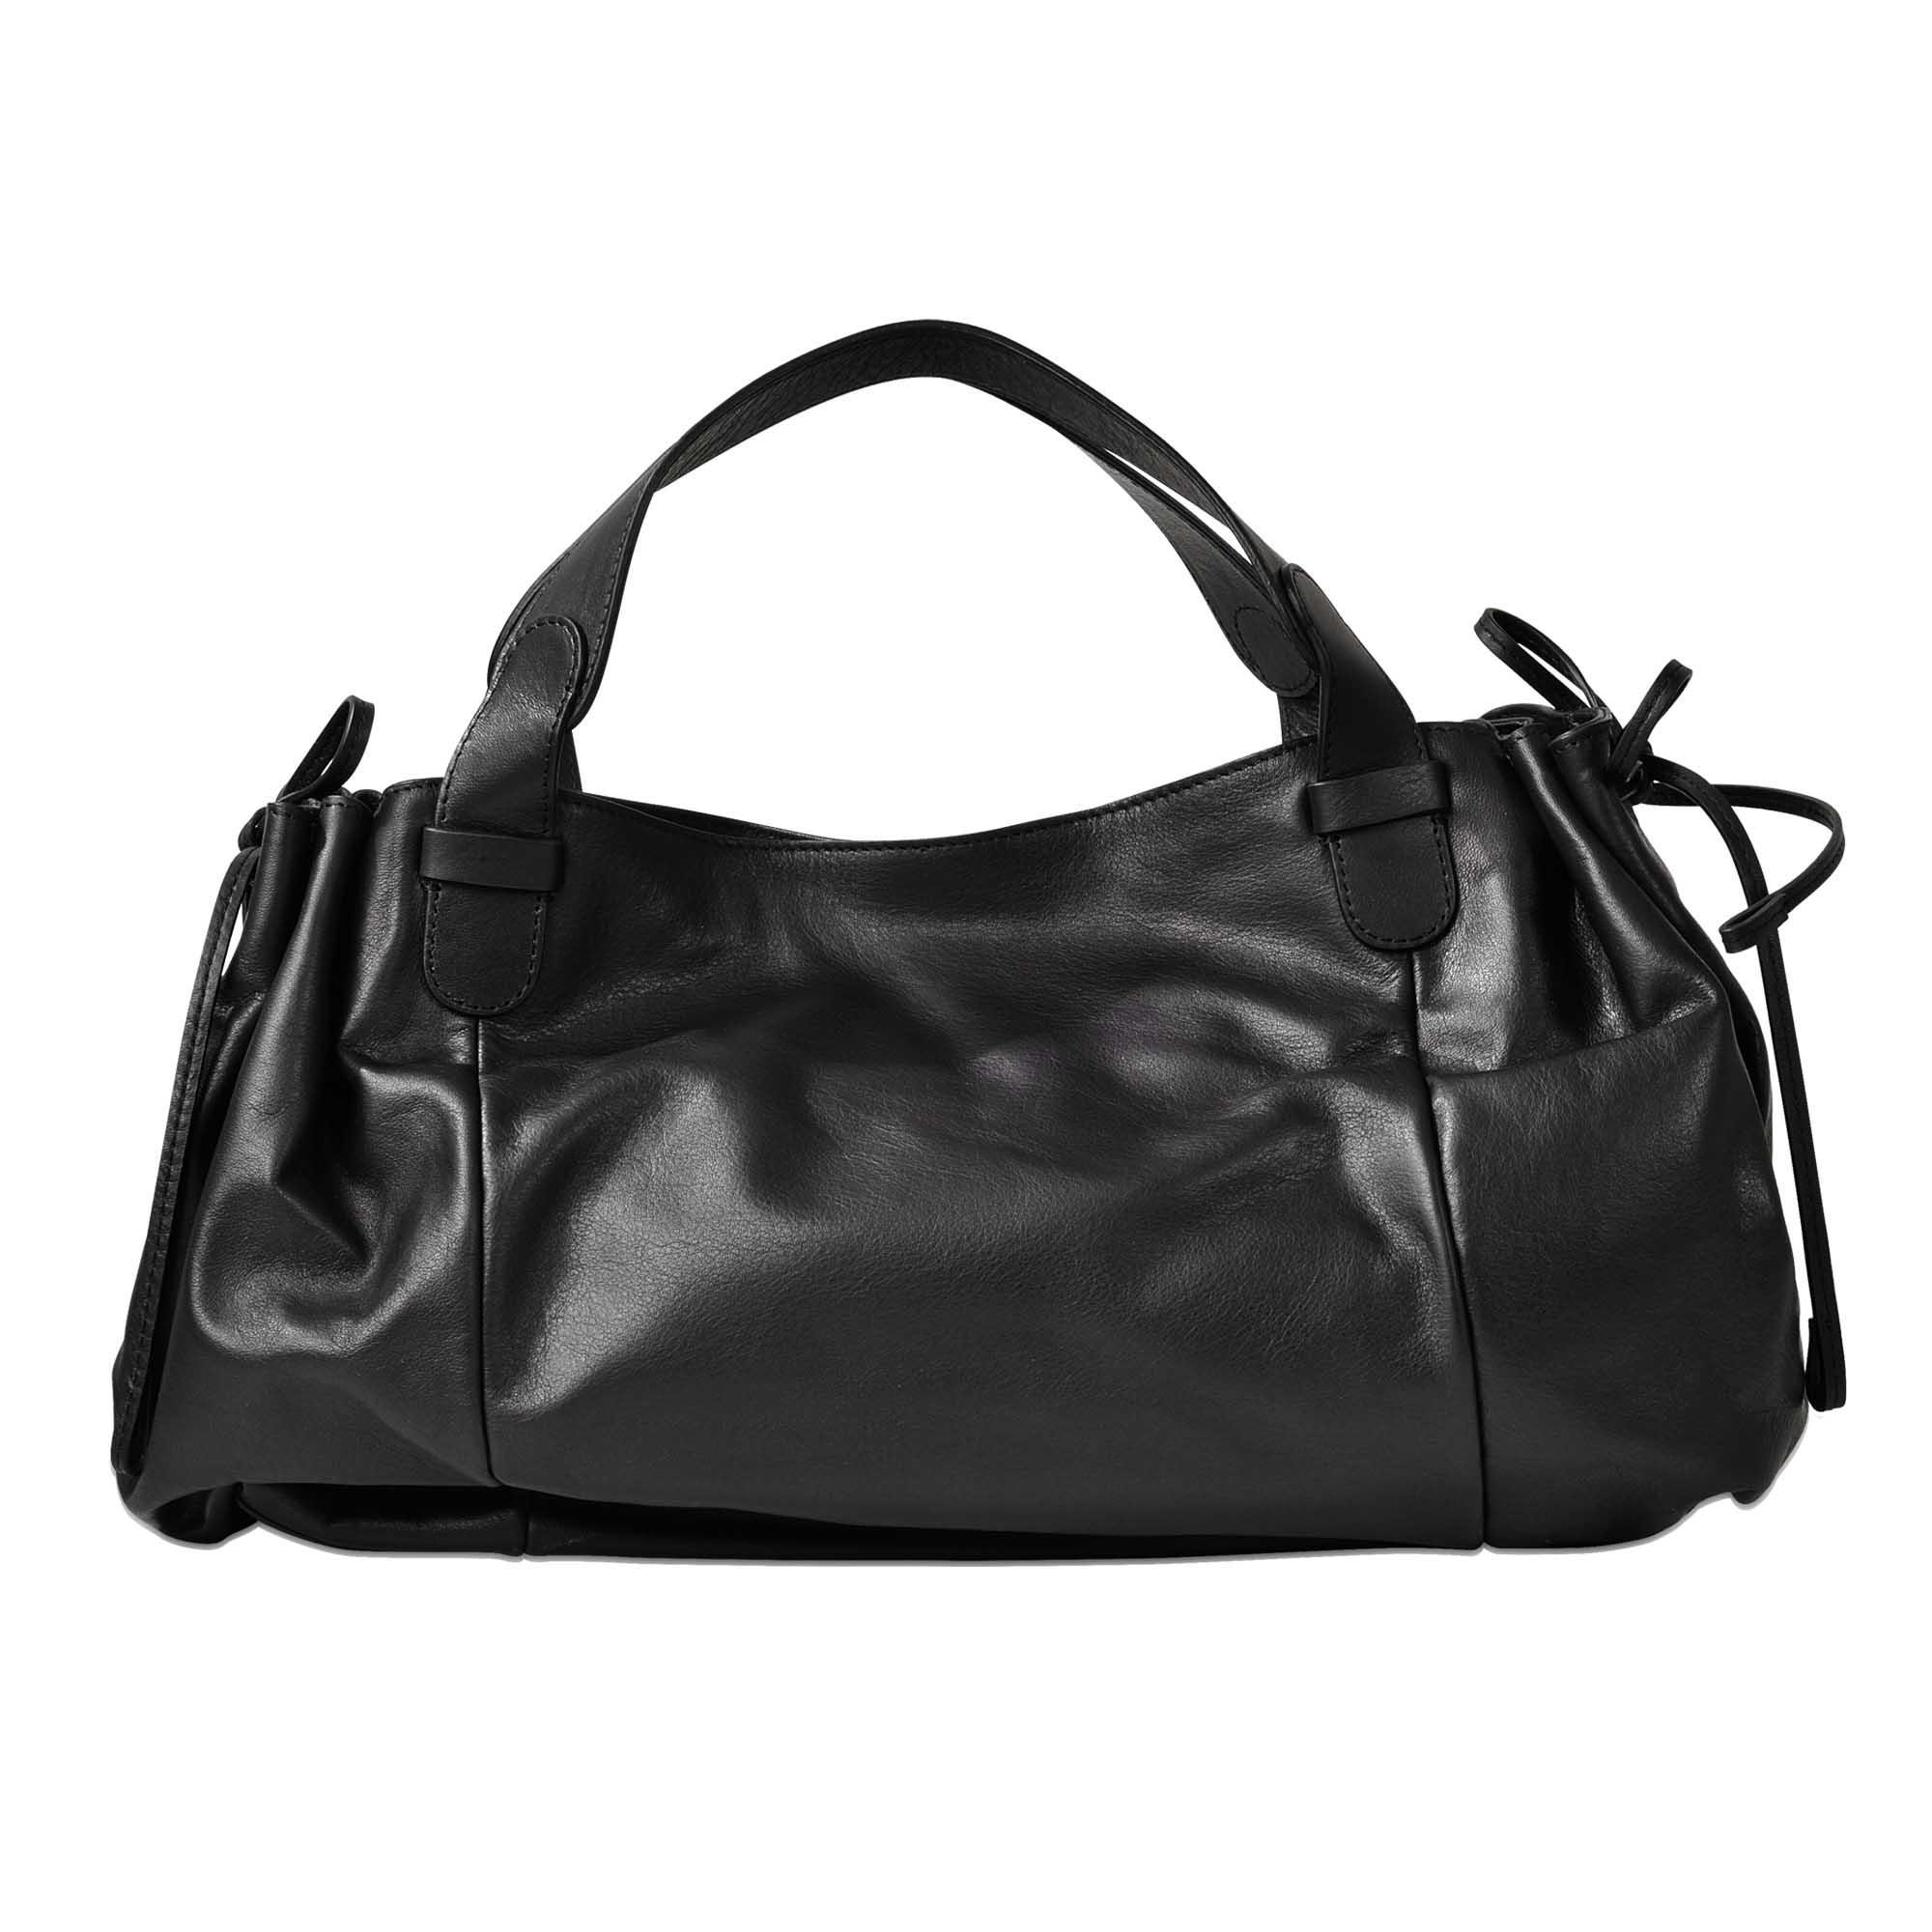 24 GD Bag in Fuchsia Leather Gerard Darel 1ACXm7xI